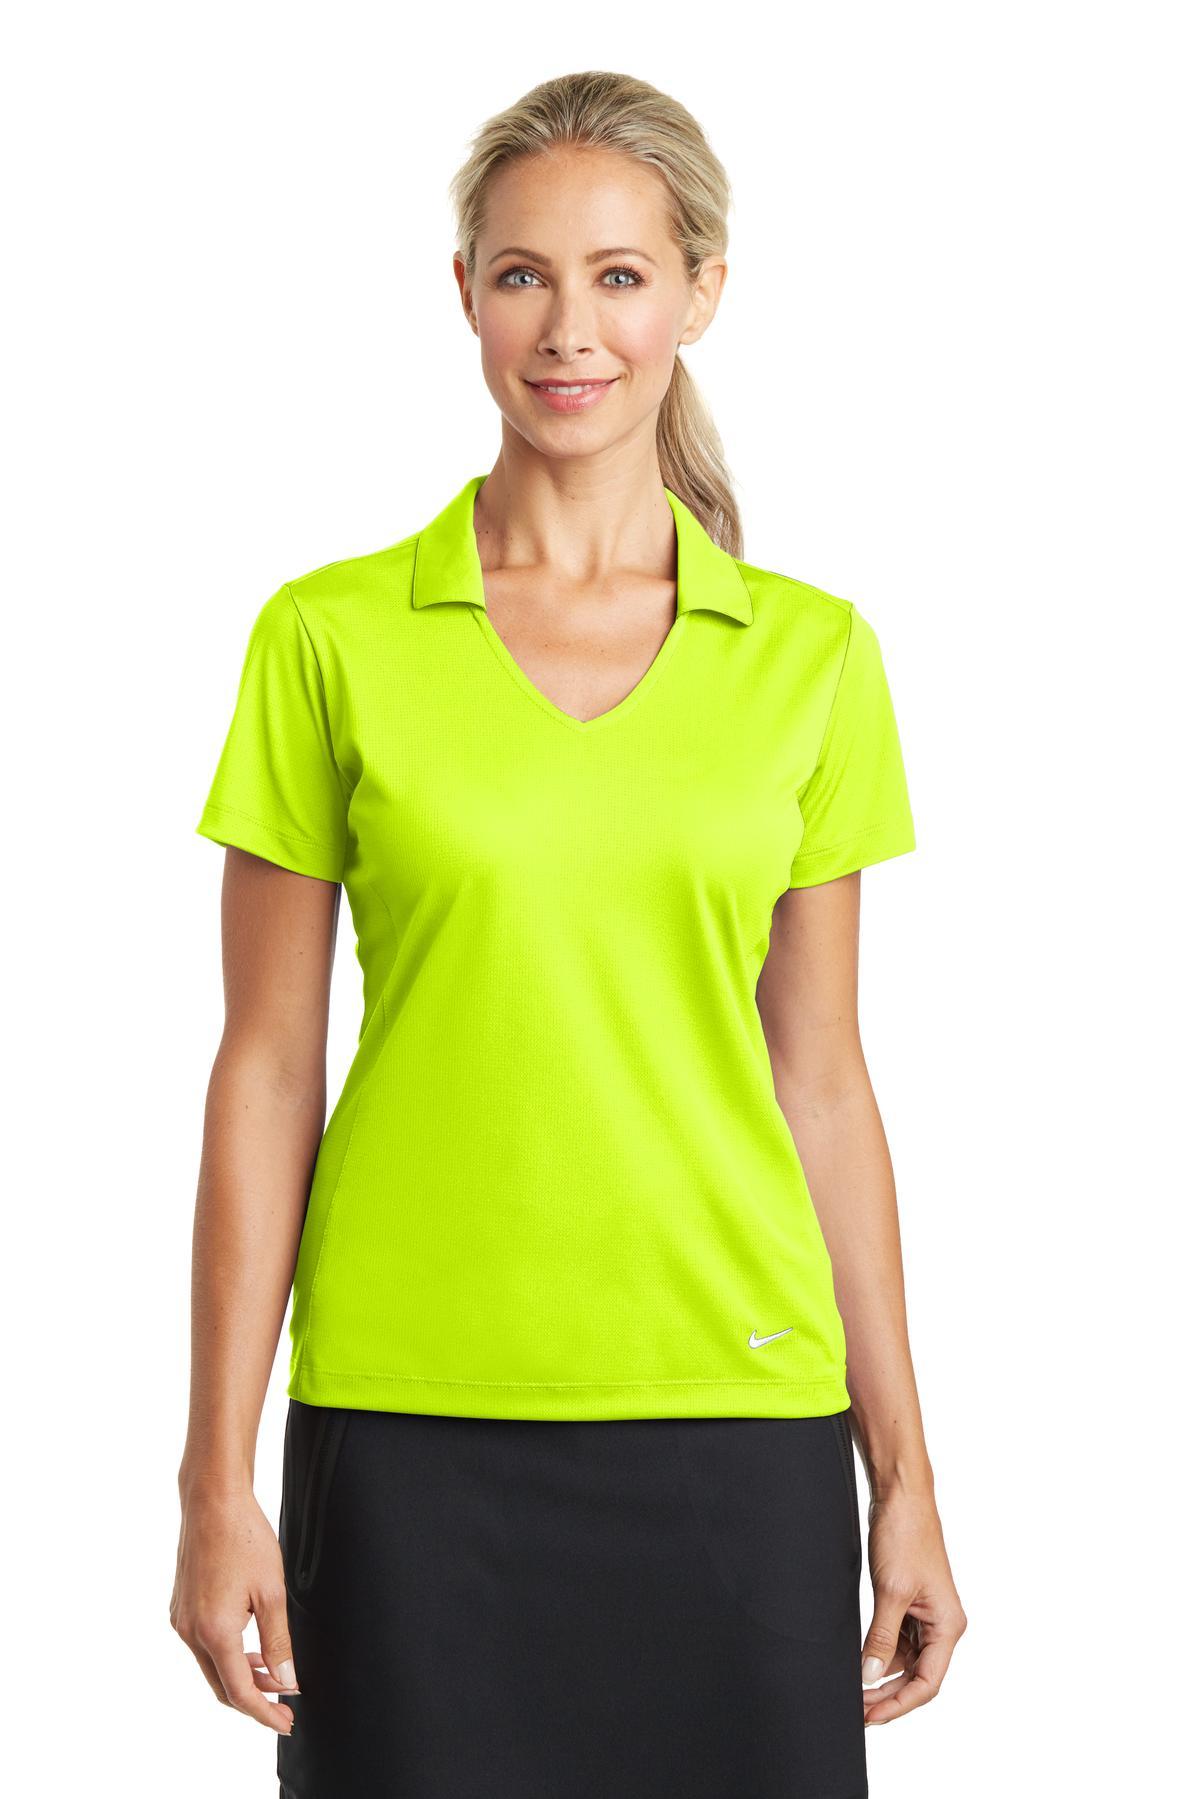 58aad6e97 Nike Golf 637165 - Ladies Dri-FIT Vertical Mesh Polo - Women s T-Shirts